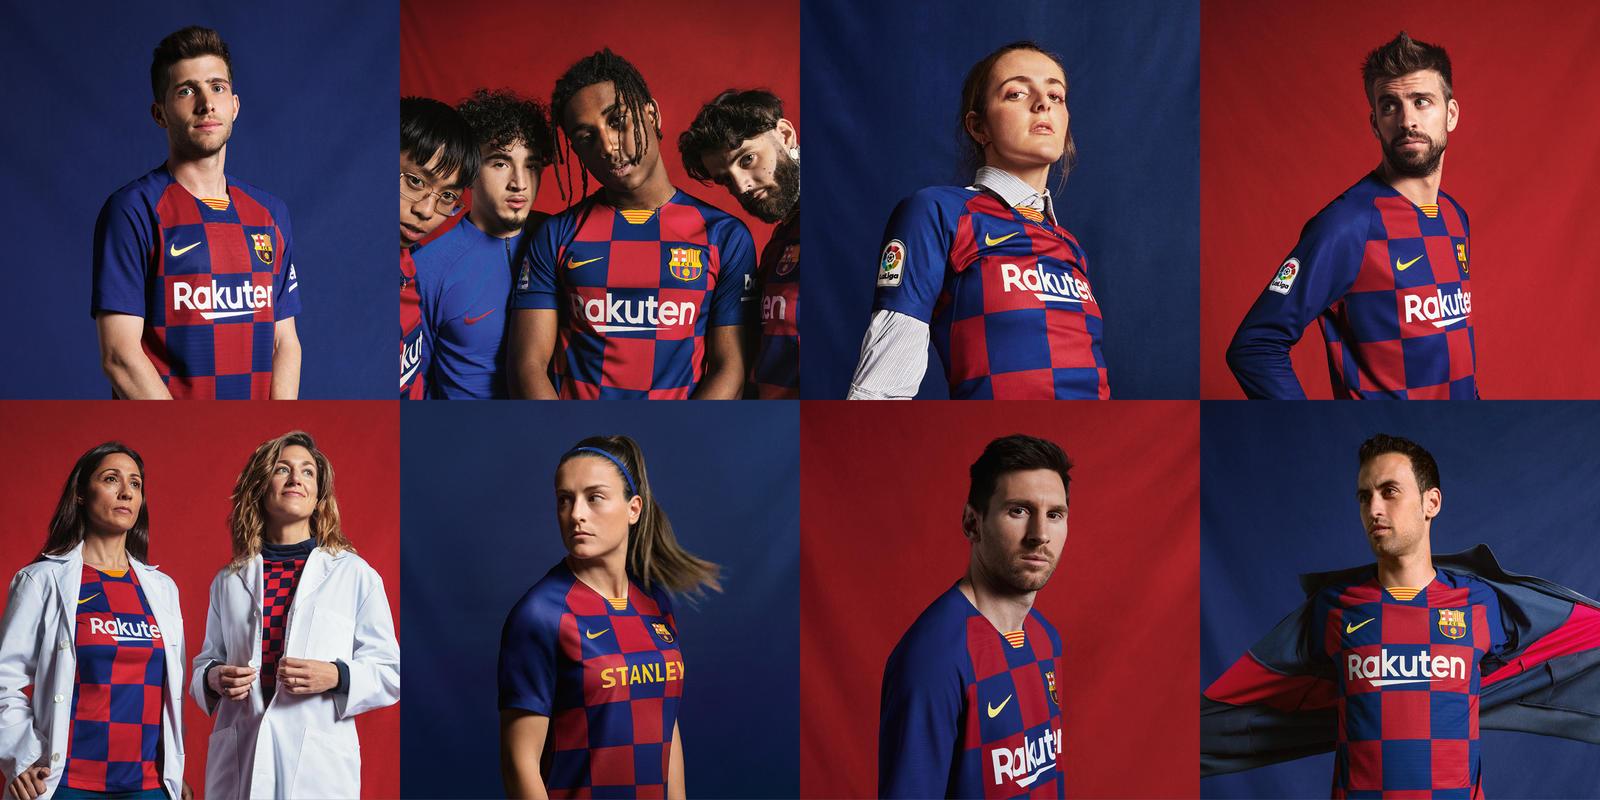 new product fa310 dc2d7 FC Barcelona 2019/20 Nike Home Kit - FOOTBALL FASHION.ORG